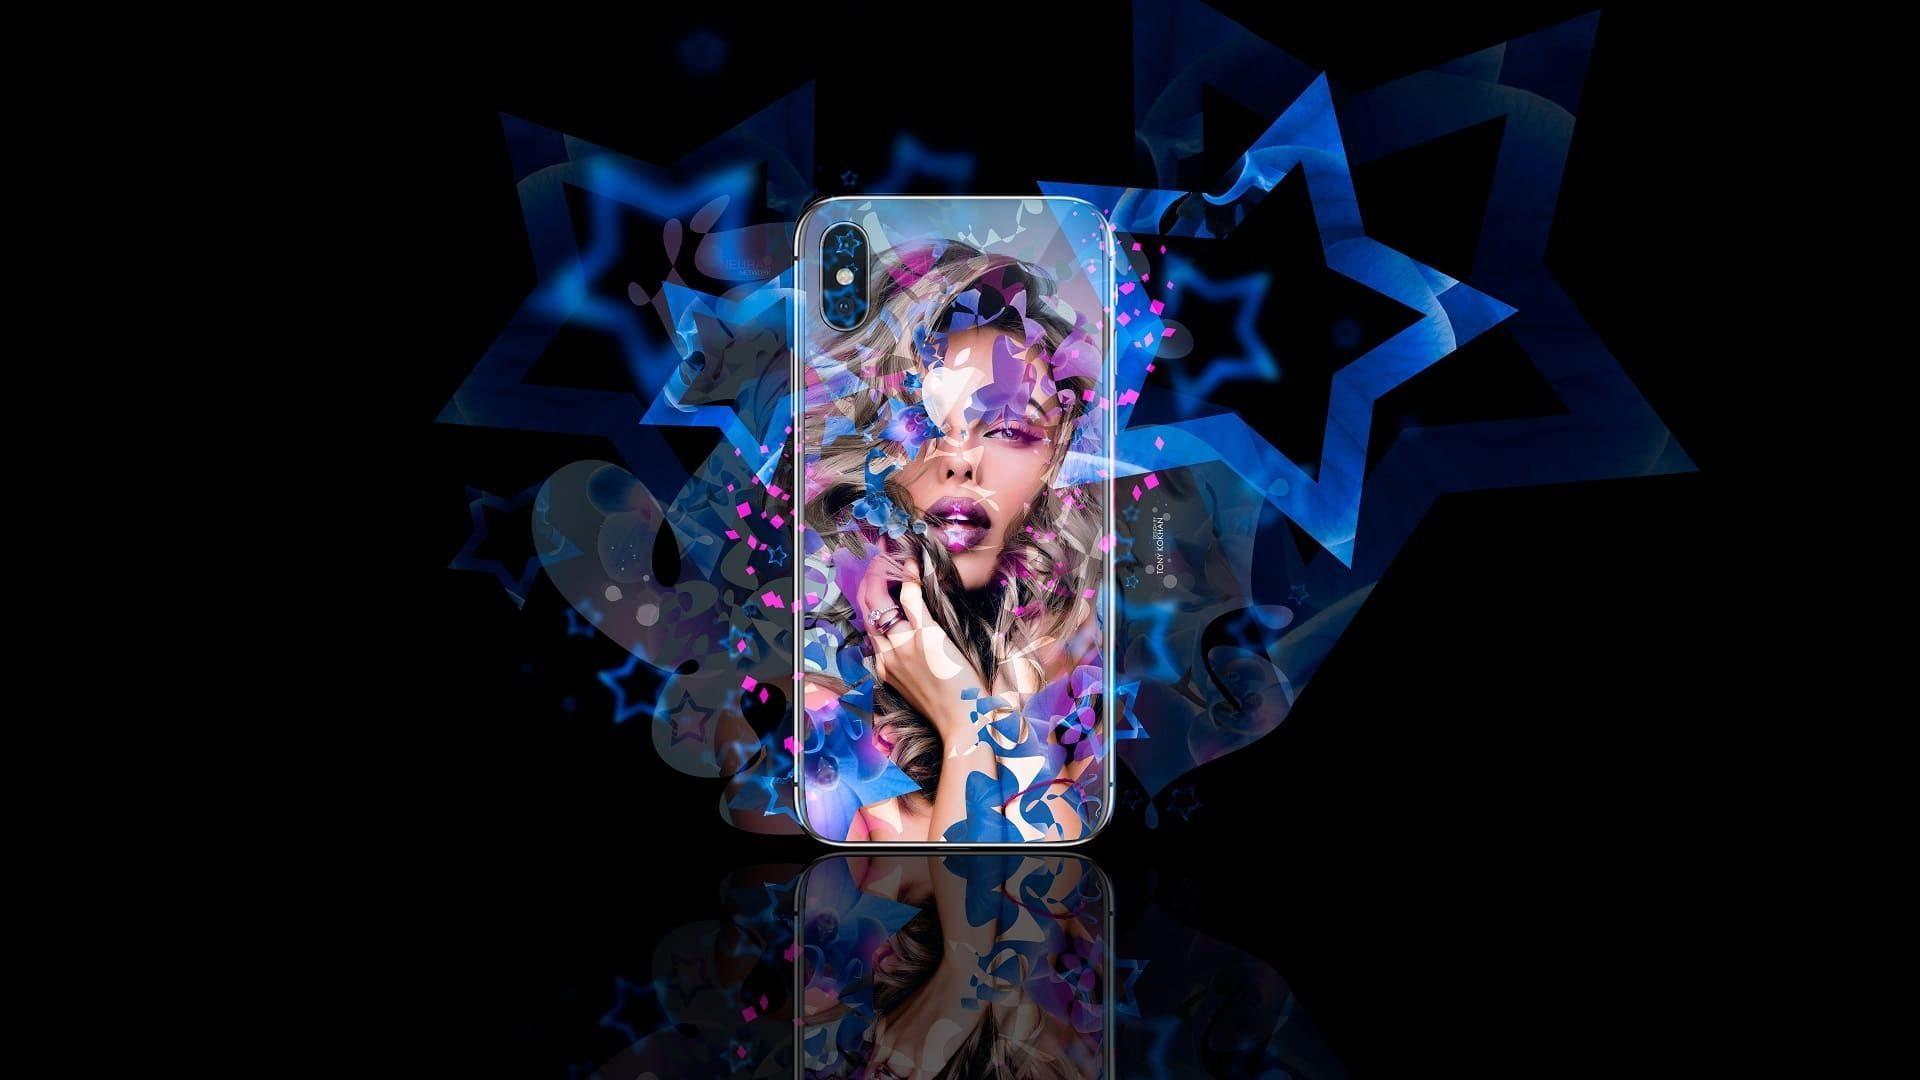 Музыка из рекламы Face ID iPhone X